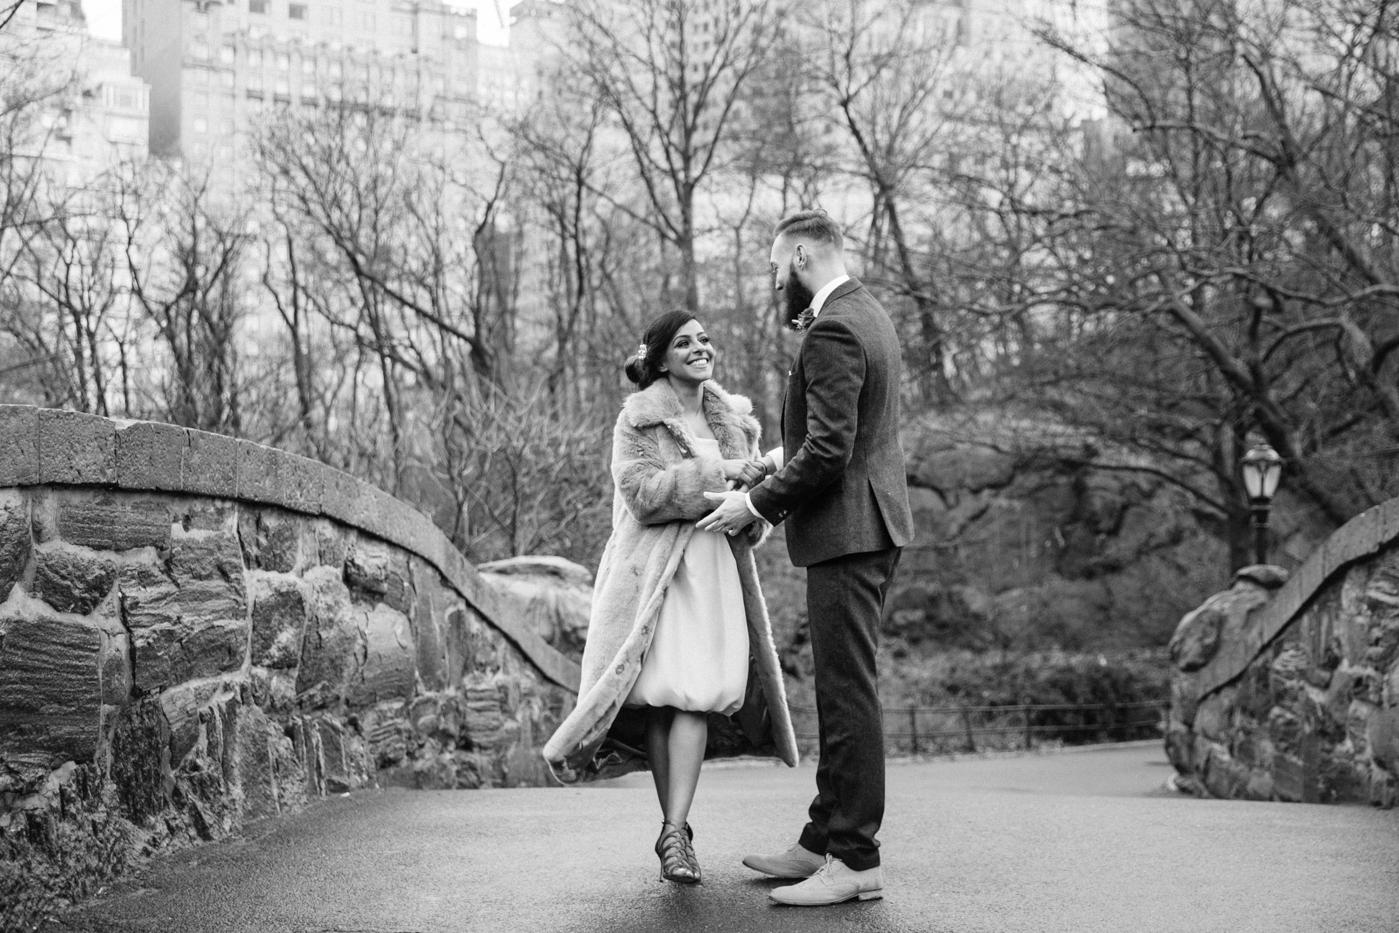 Central-park-wedding-by-Tanya-Isaeva-92.jpg